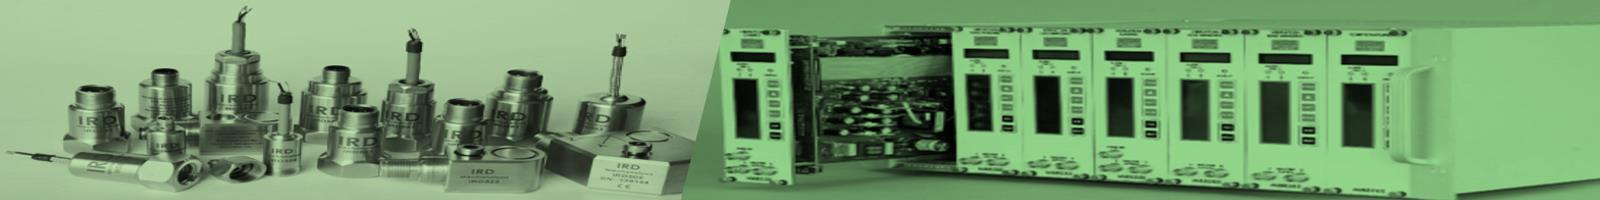 Accelerometer Premium, Top integral, On-Line